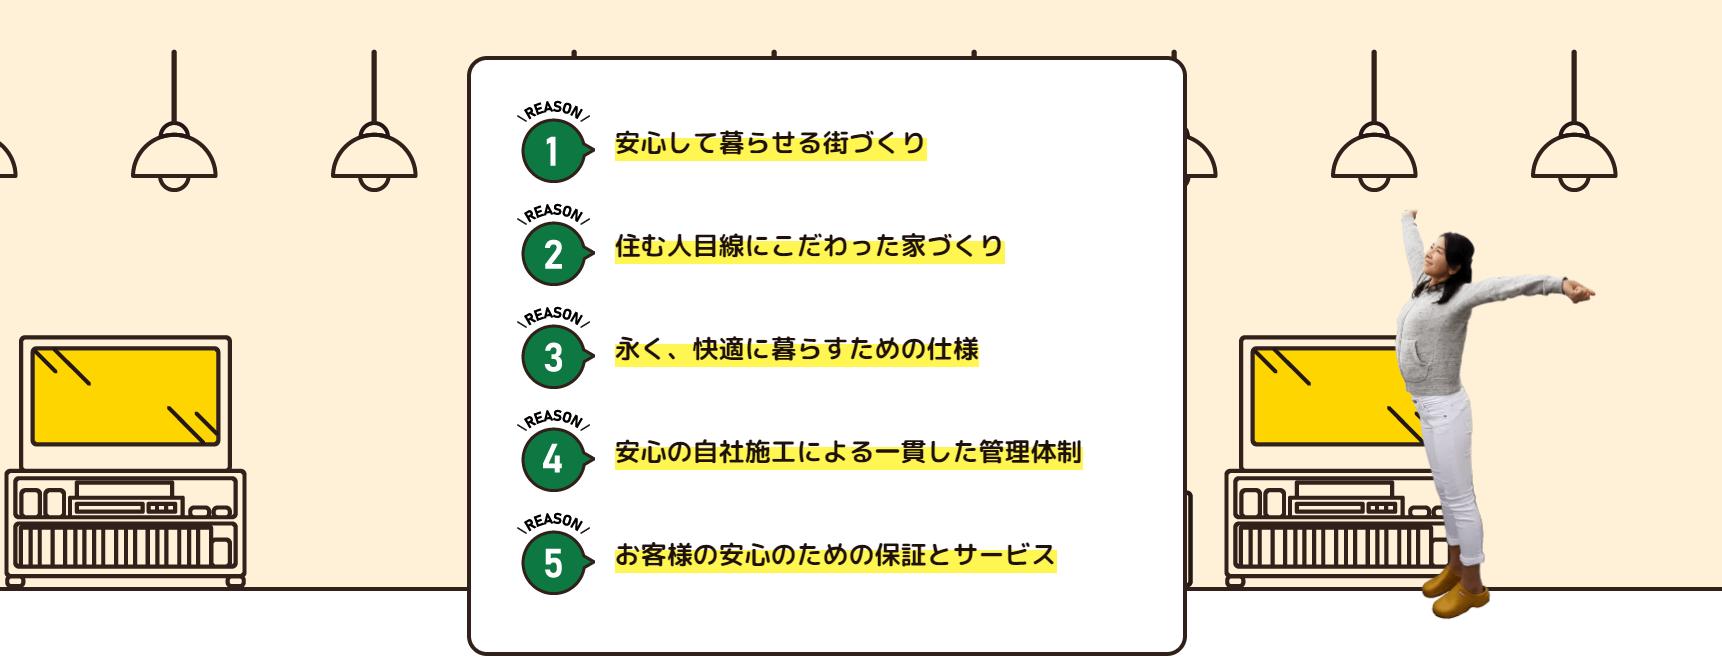 森本興産株式会社の画像4